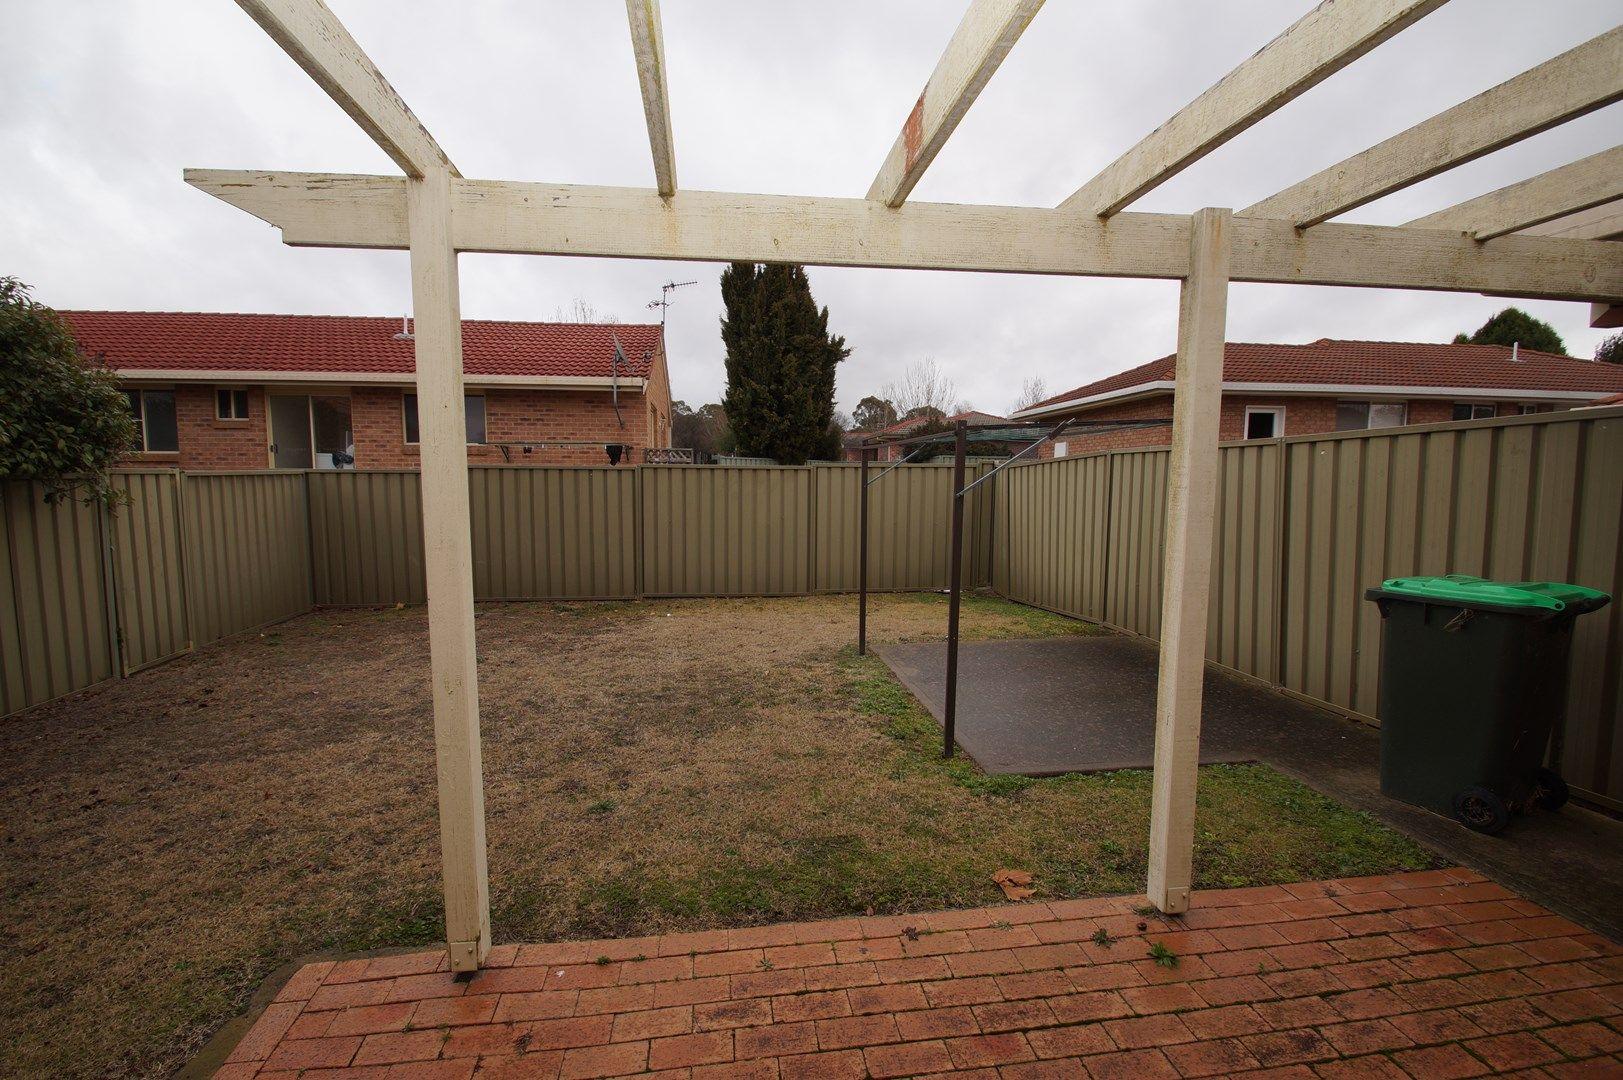 3/91 Queen Elizabeth Drive, Armidale NSW 2350, Image 0